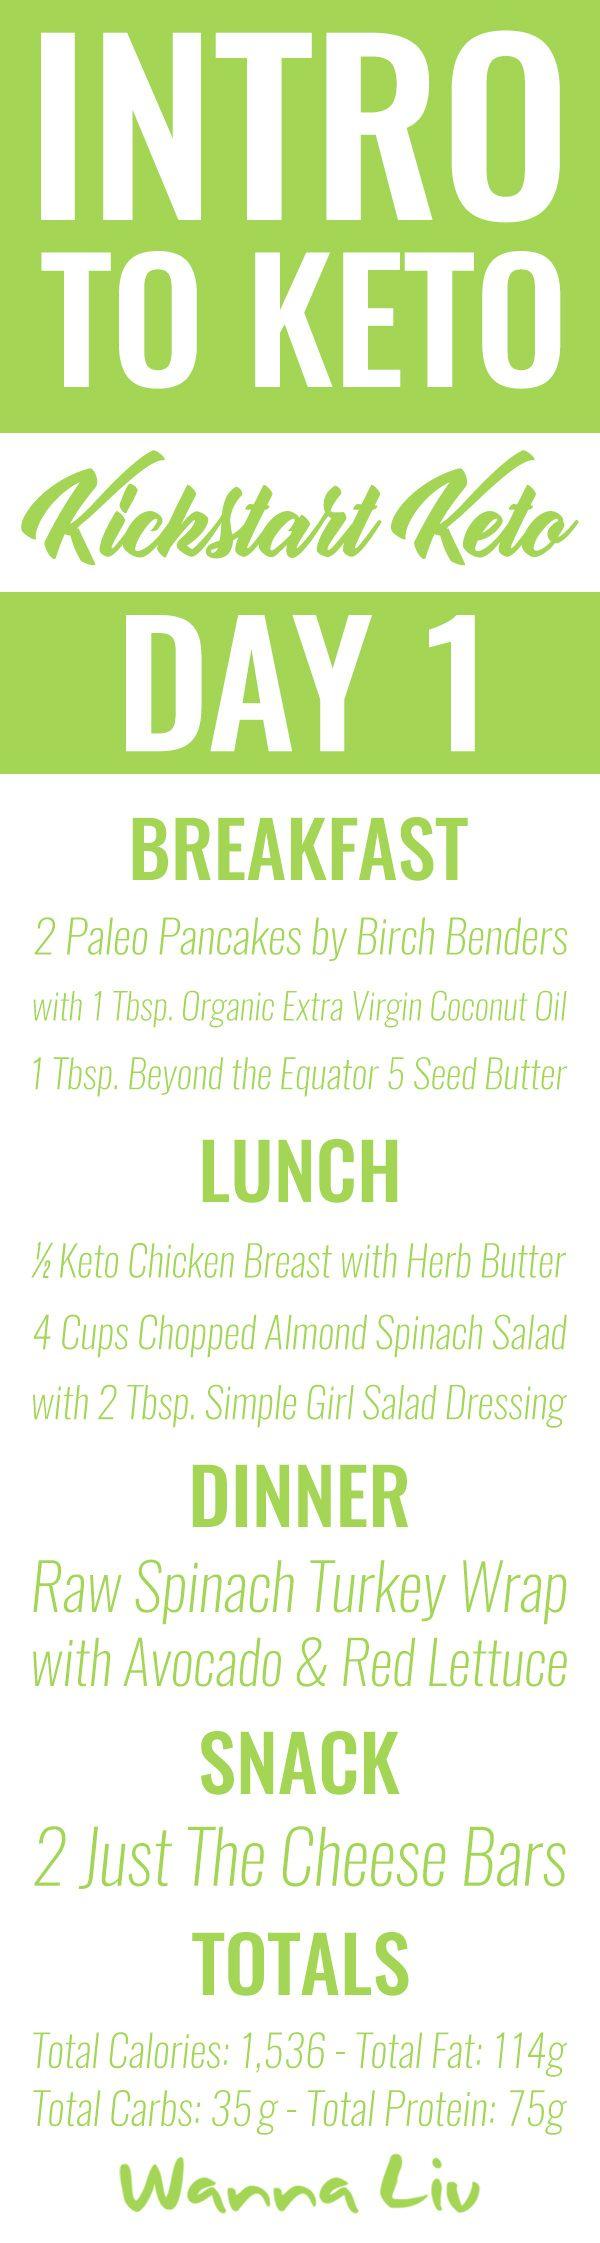 3 Day Keto Kickstart Meal Plan